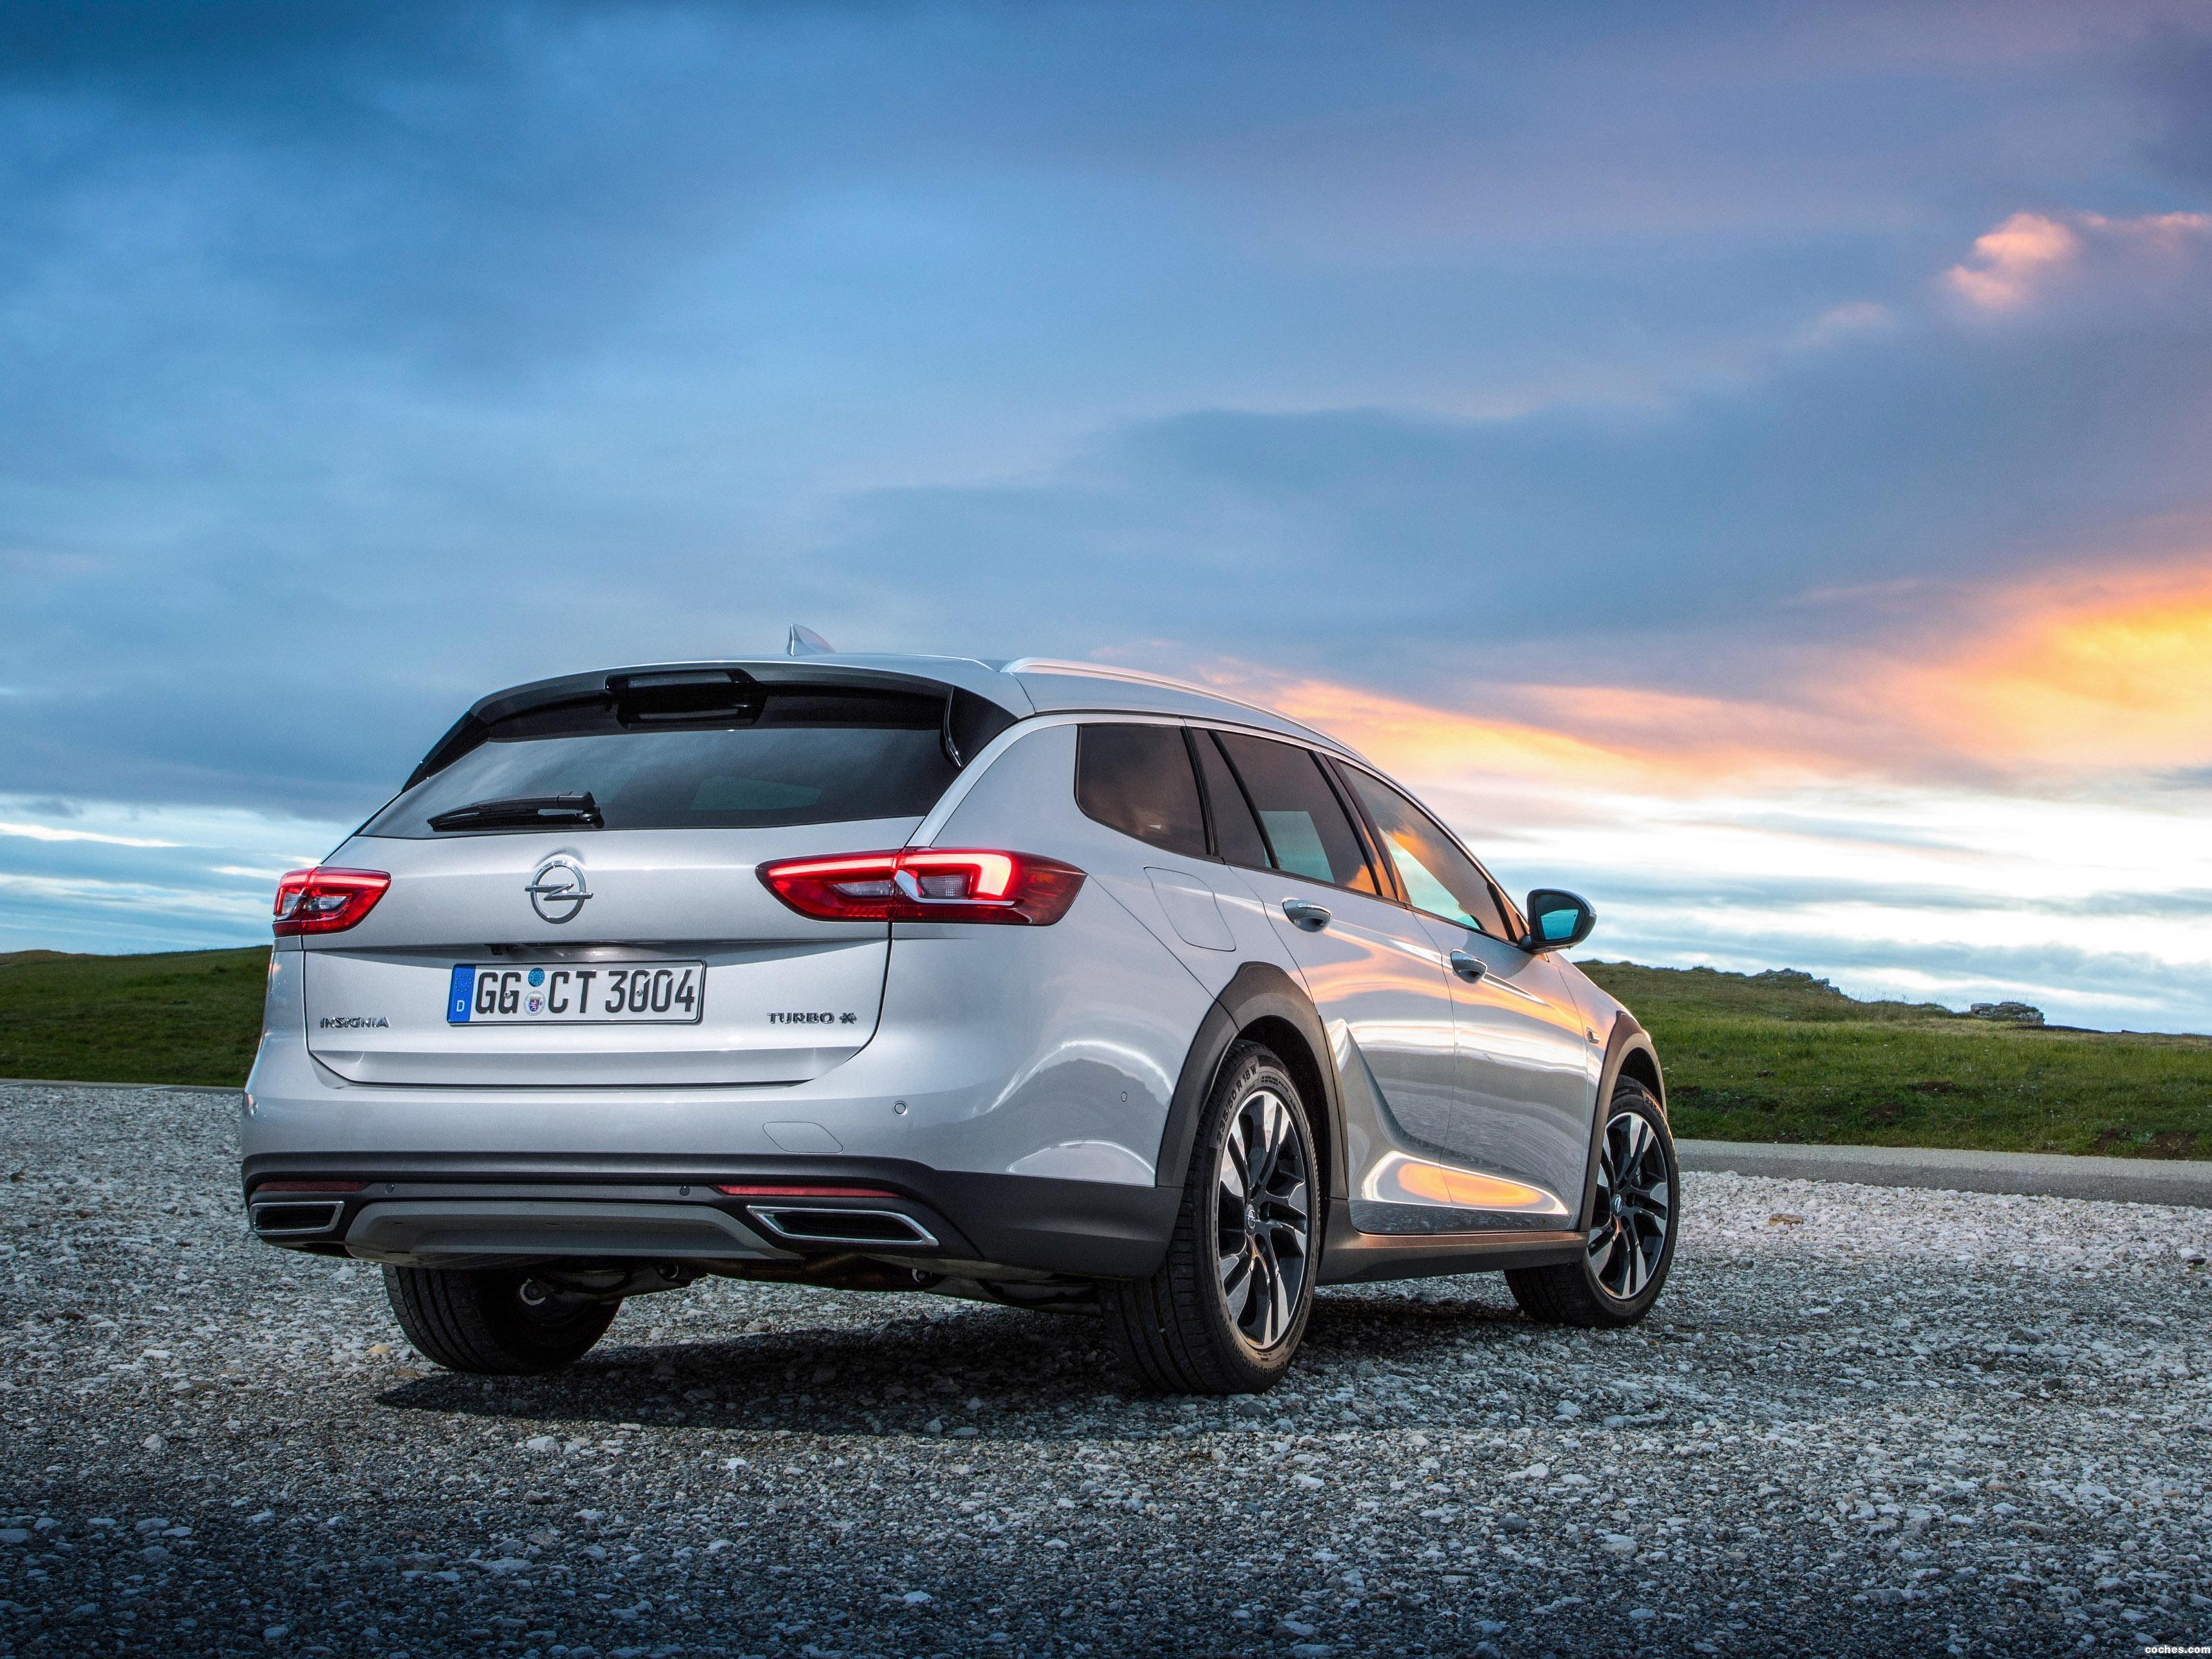 Foto 21 de Opel Insignia Country Tourer Turbo 4x4 2017